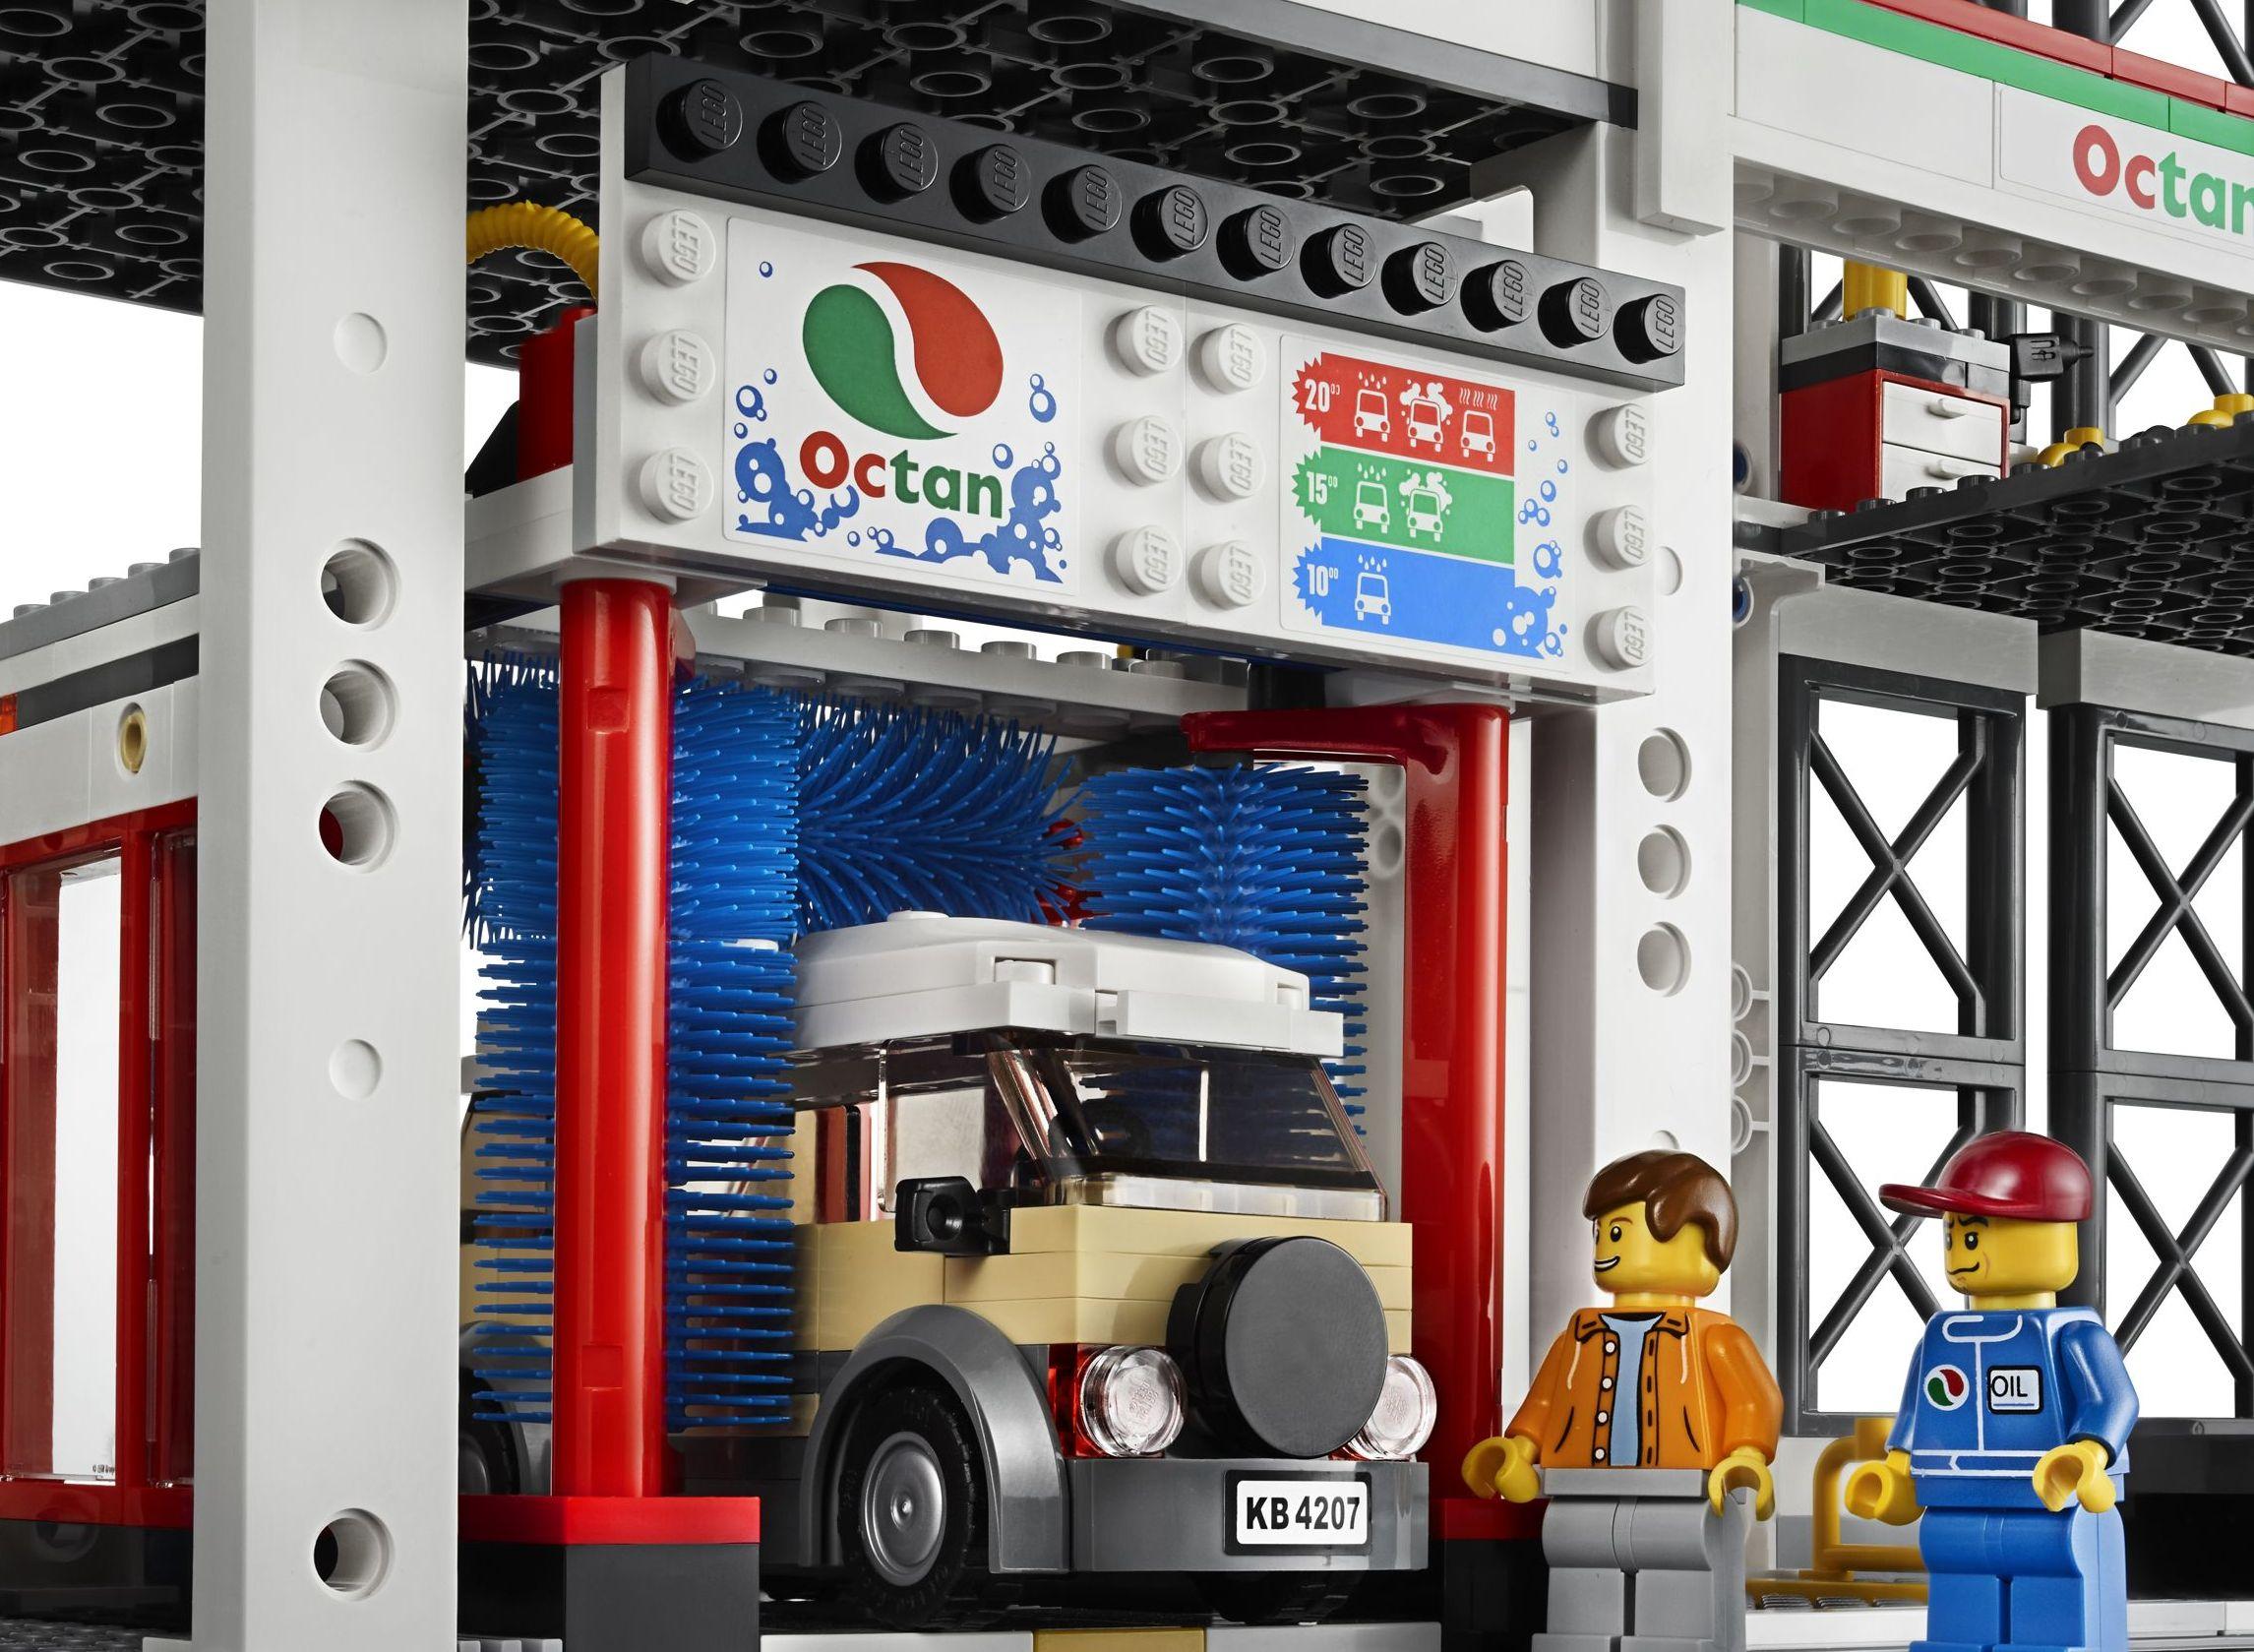 Lego City 4207 Garage Car Parking Released I Brick City